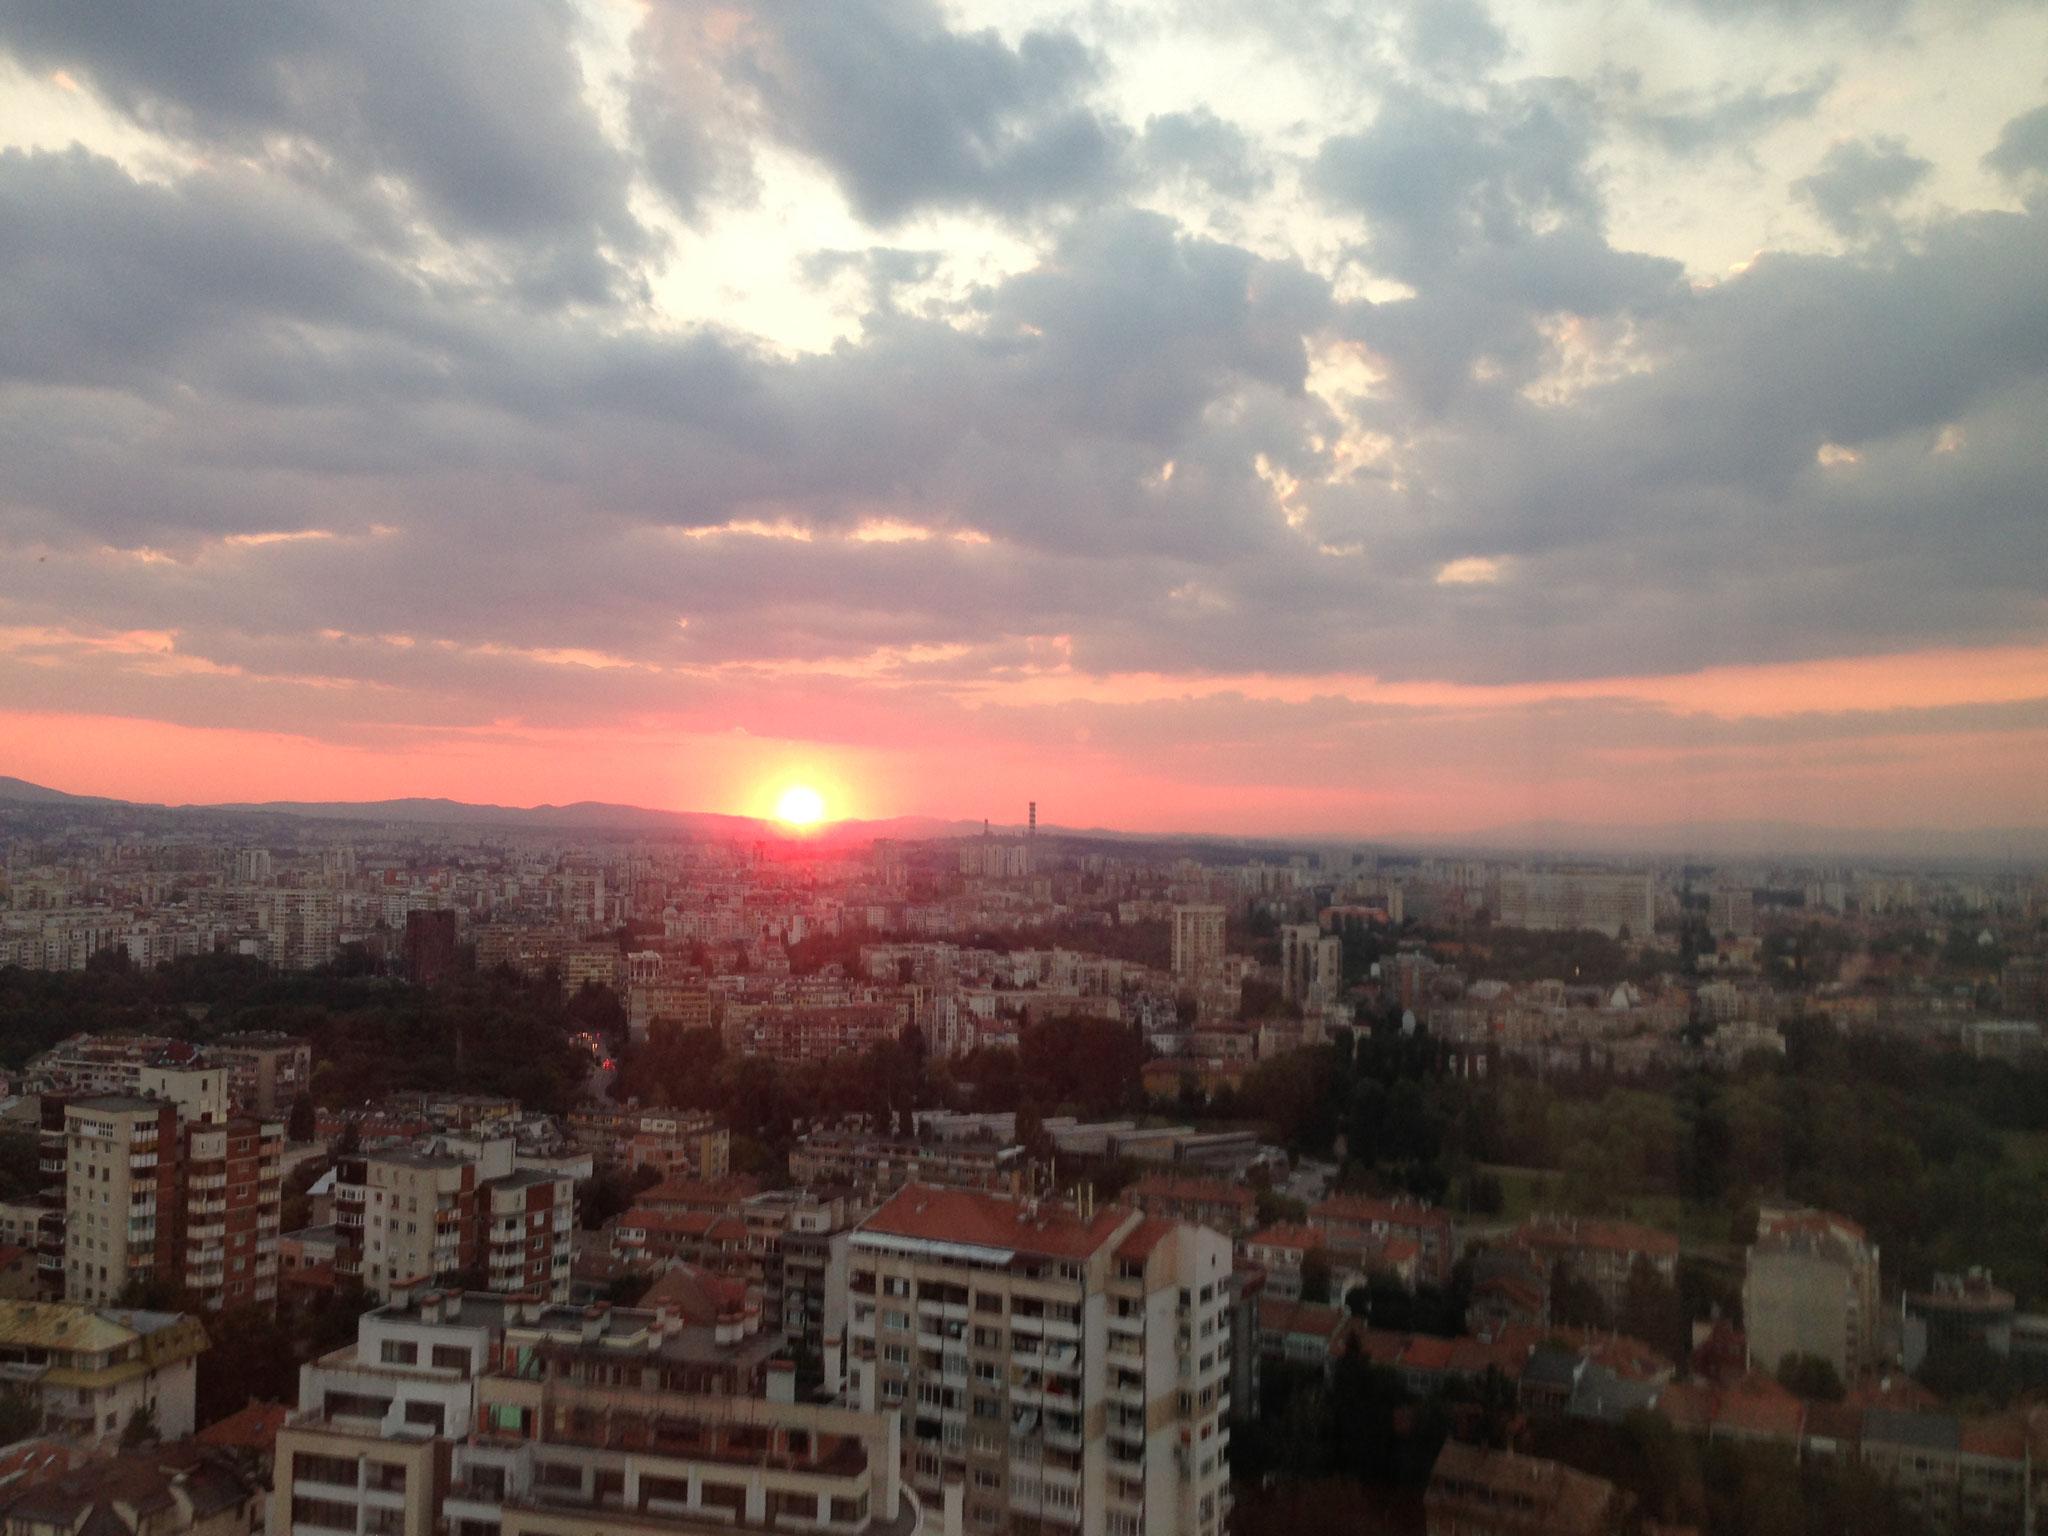 Sonnenuntergang in Sofia